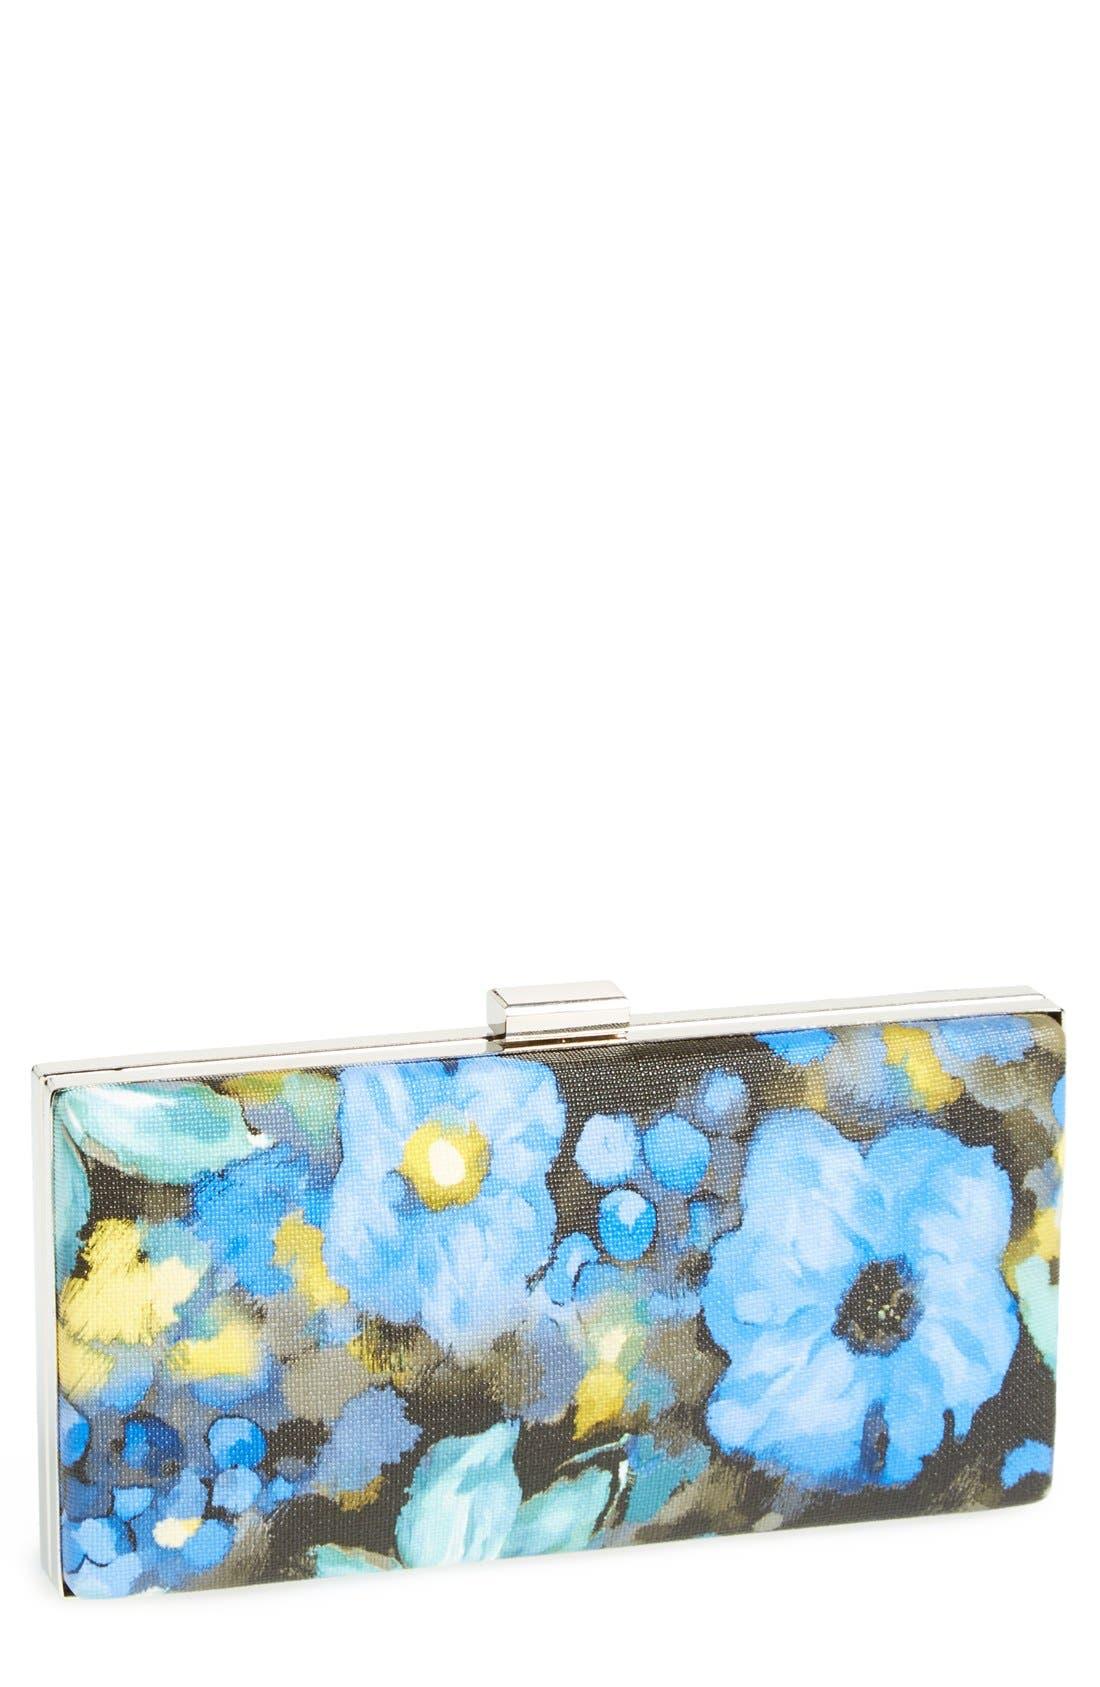 Natasha Couture 'Watercolor' Box Clutch, Main, color, 411